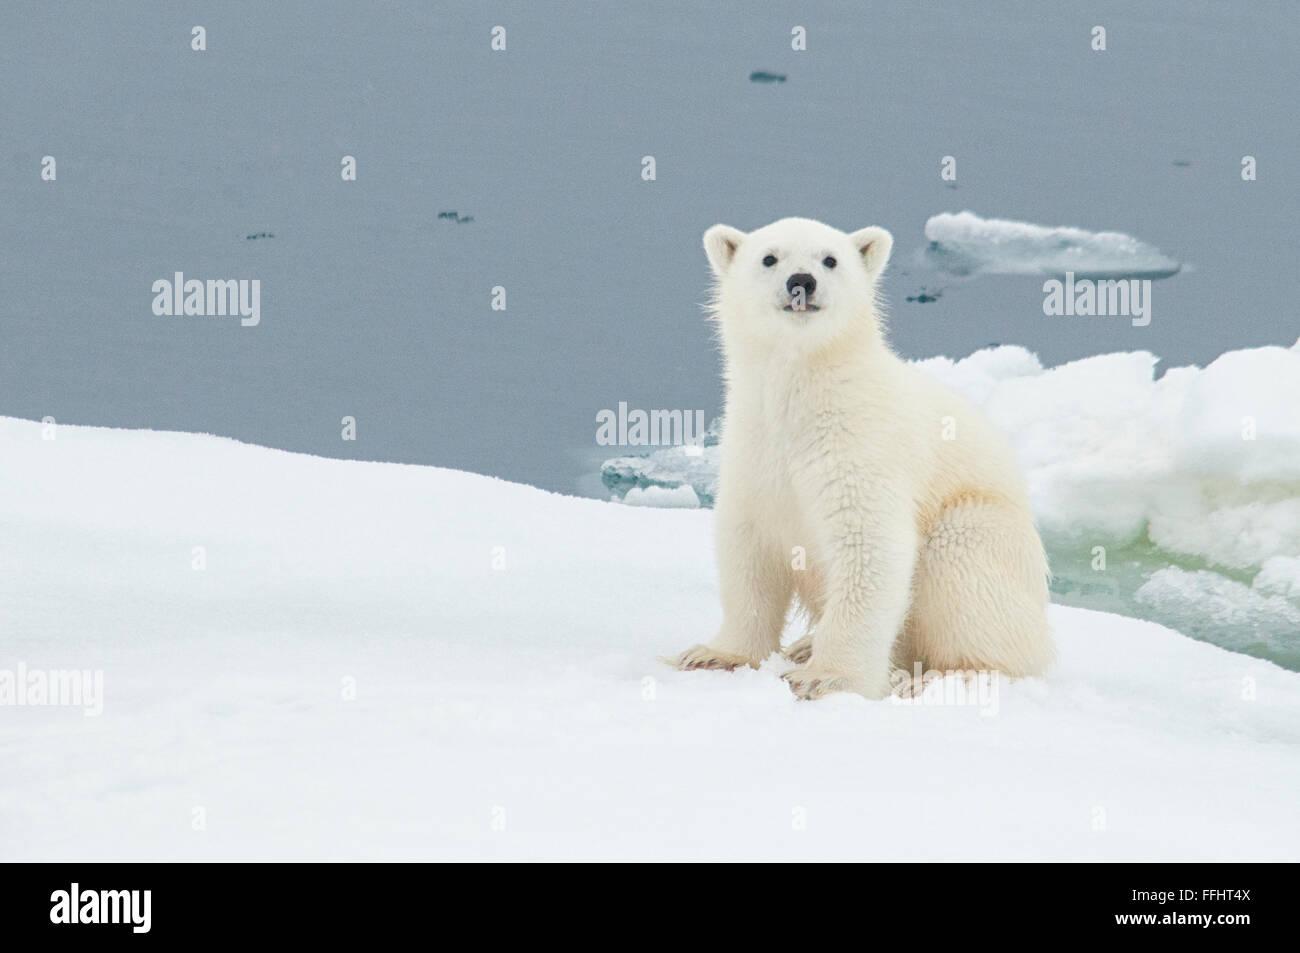 Cute little Polar Bear Cub, Ursus Maritimus, sitting on an ice floe in the arctic sea, Svalbard Archipelago, Norway Stock Photo